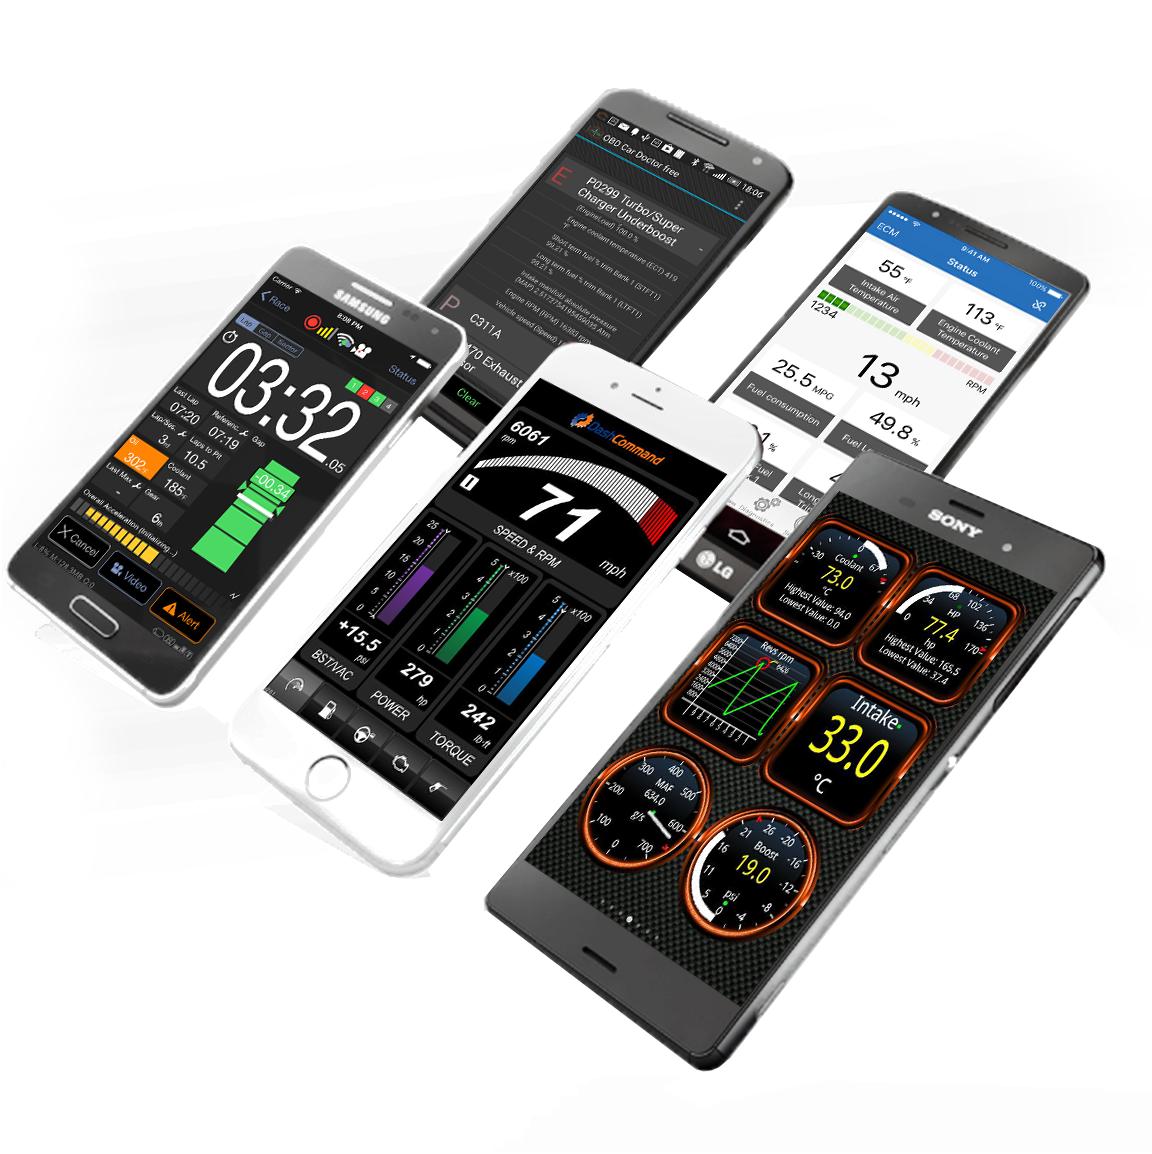 Kiwi 3 Obd2 Obdii Wireless Bluetooth Diagnostic Scanner